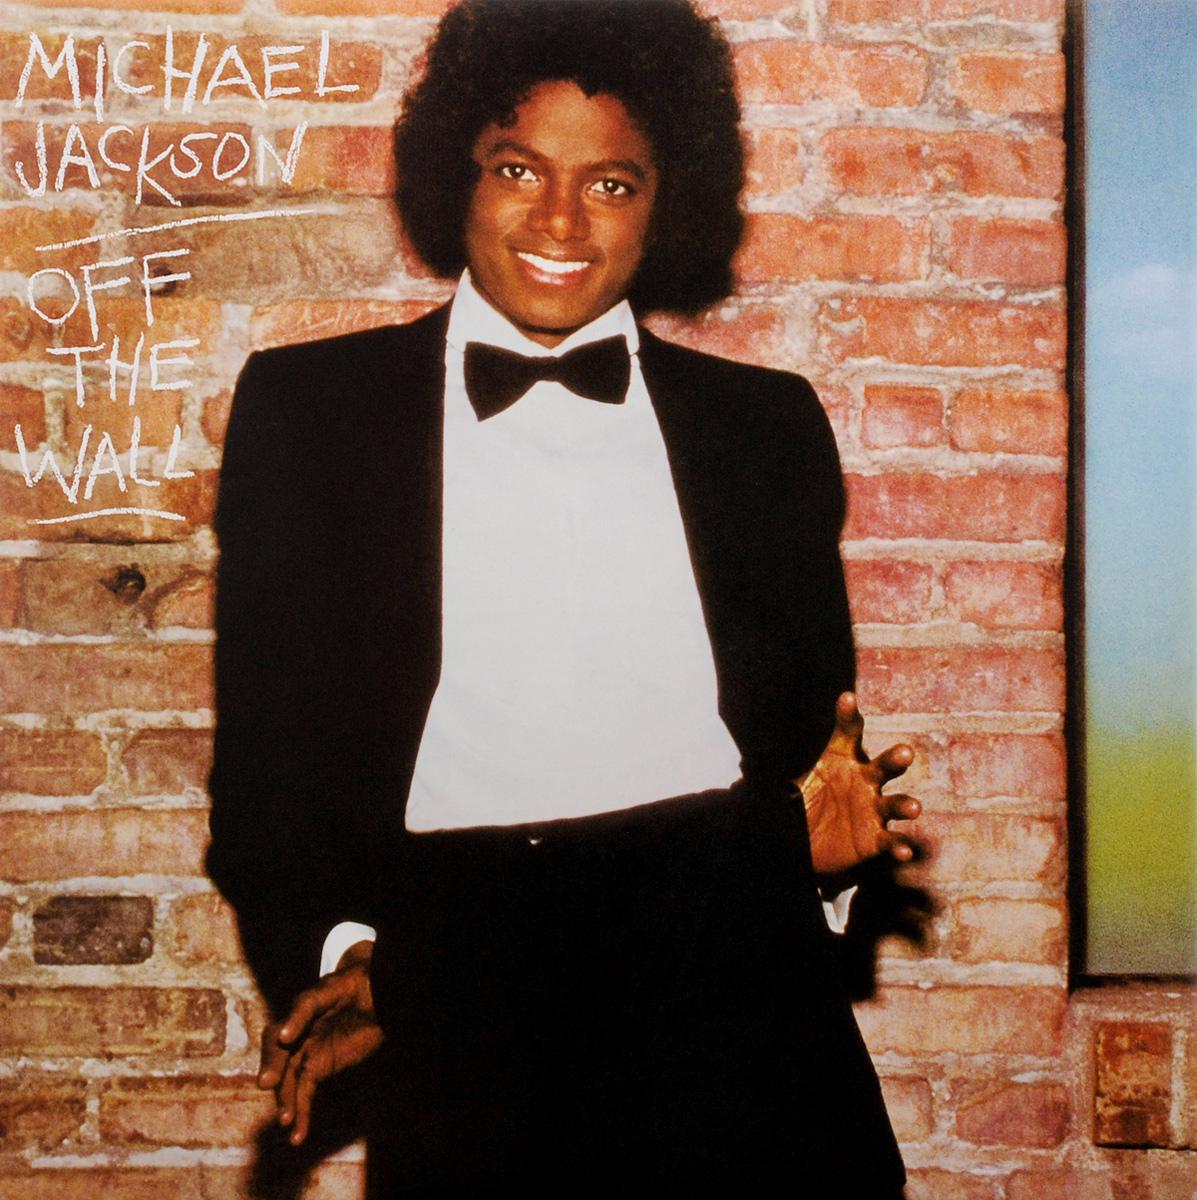 Майкл Джексон Michael Jackson. Off The Wall (LP) кэннонболл эдерли милт джексон cannonball adderley with milt jackson things are getting better lp